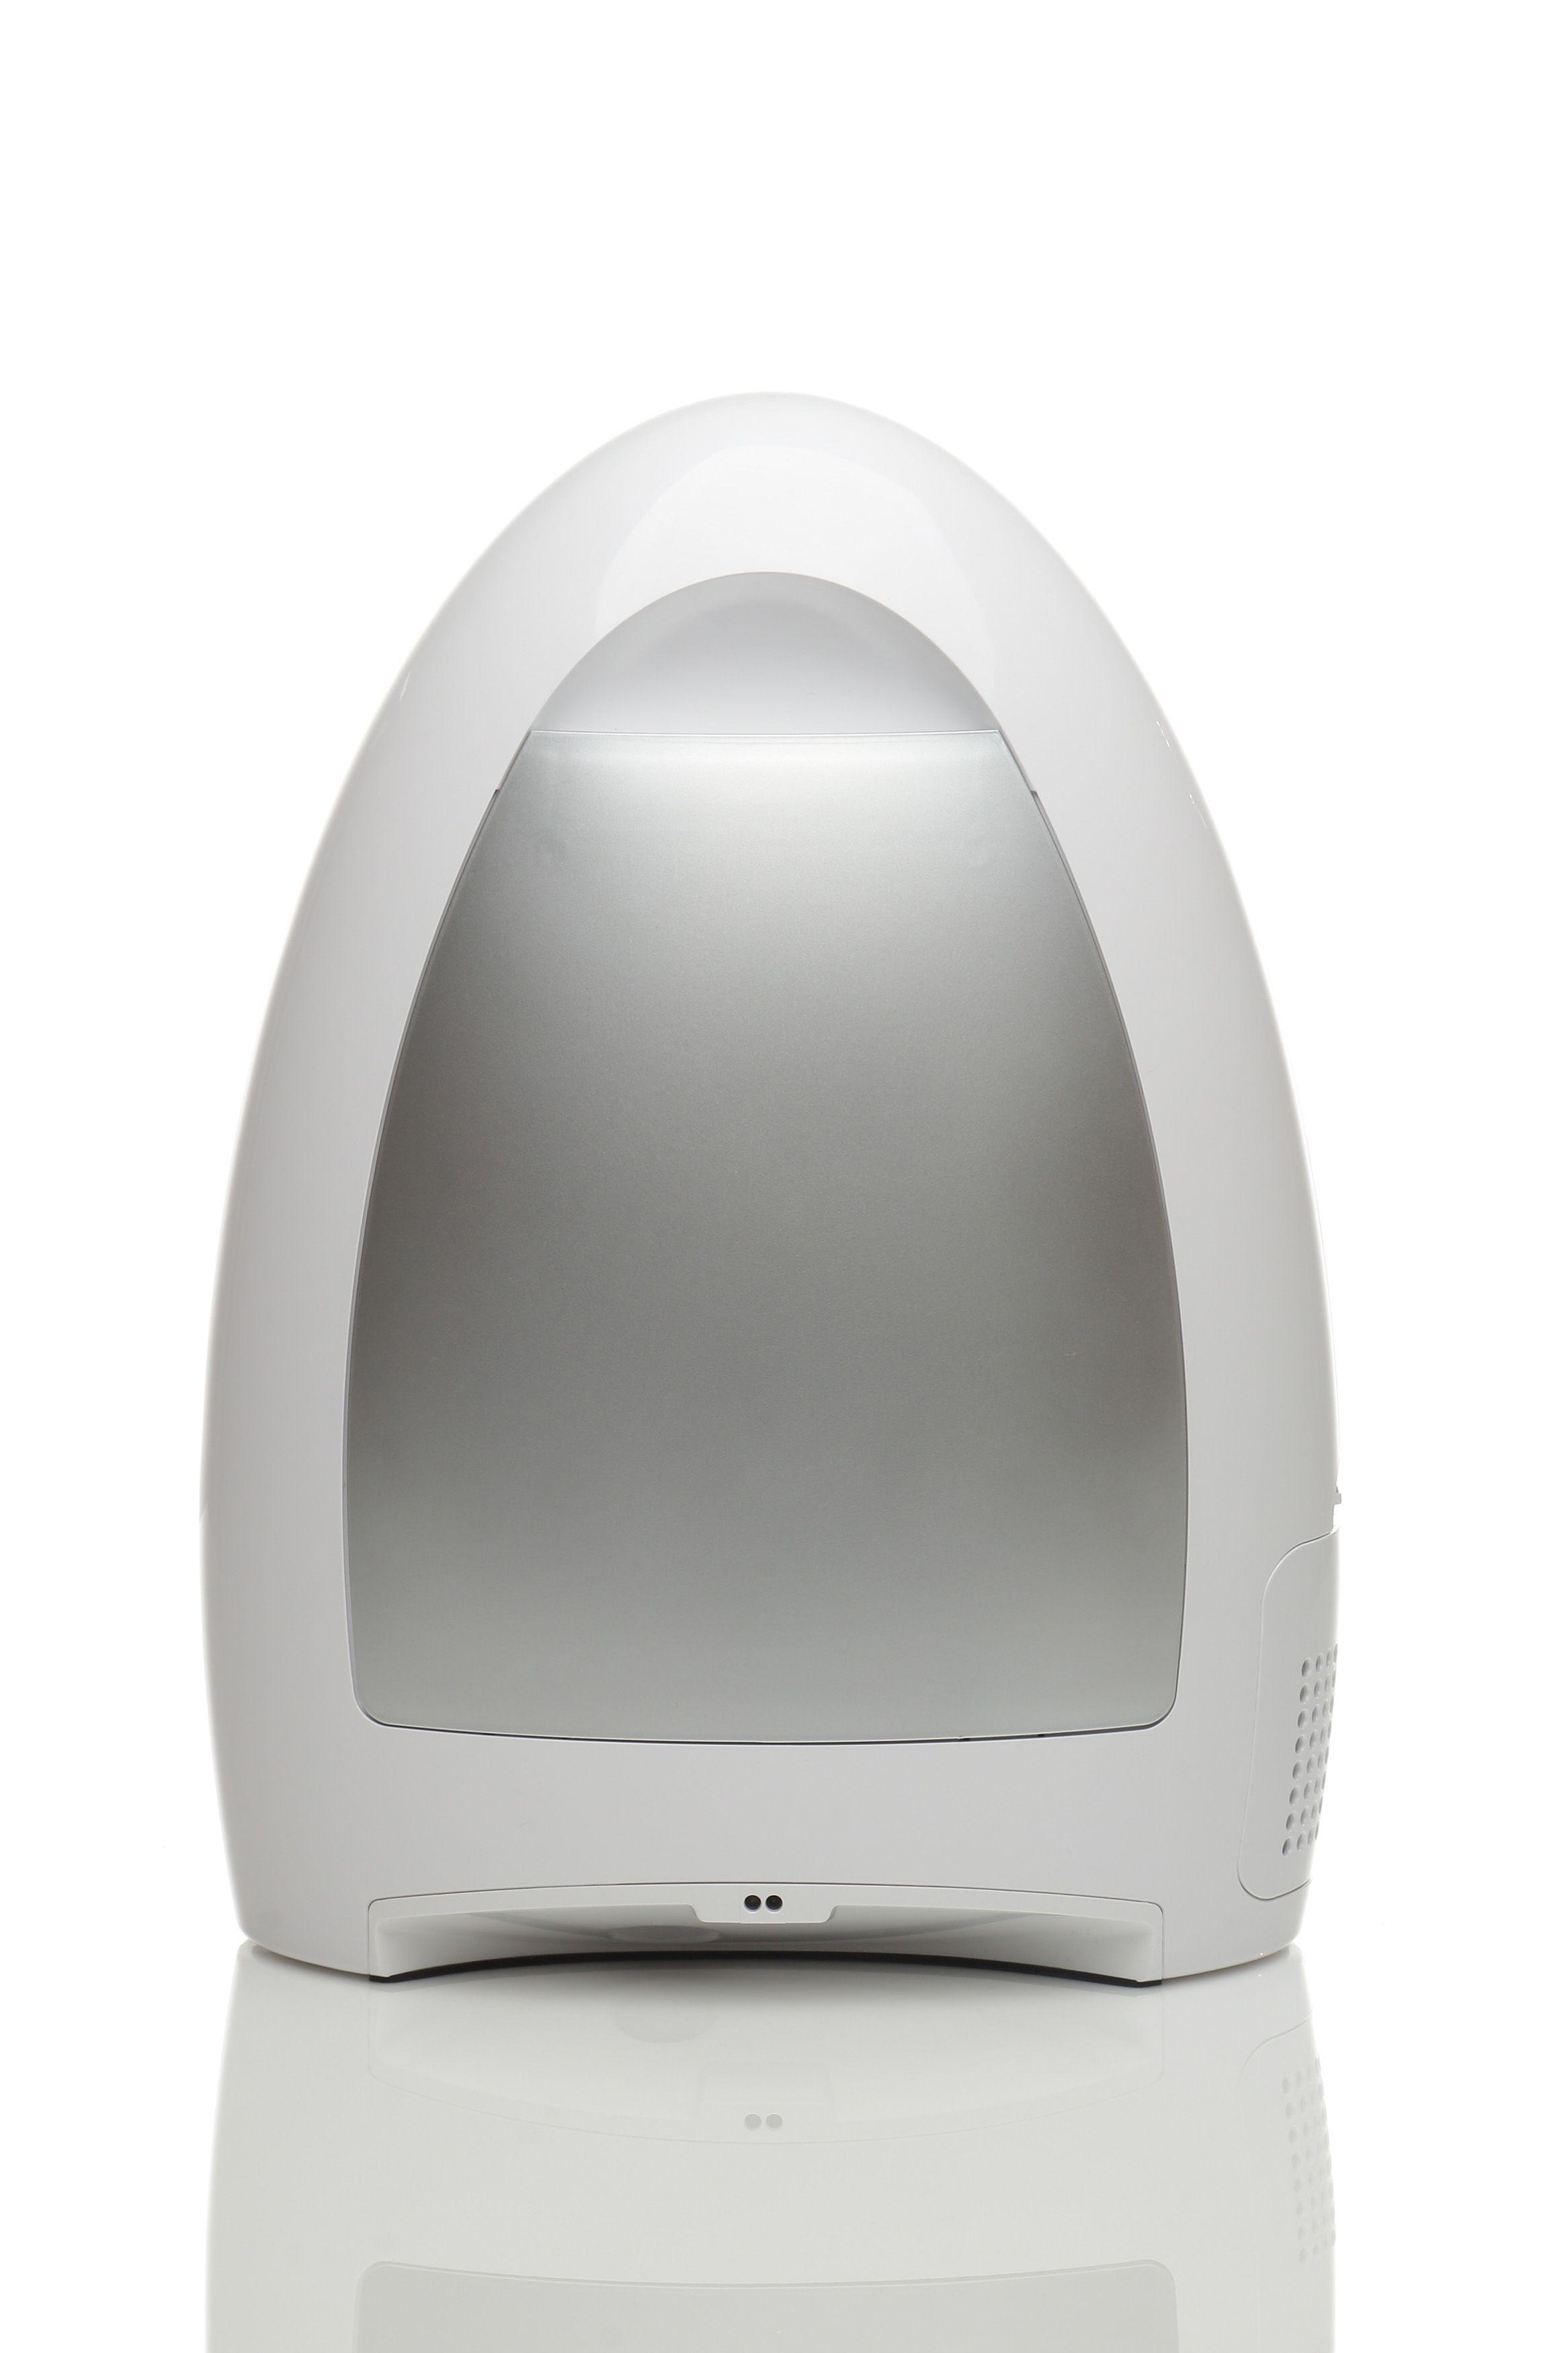 EyeVac Home Touchless Vacuum, White - Walmart.com   Christmas 2018 ...